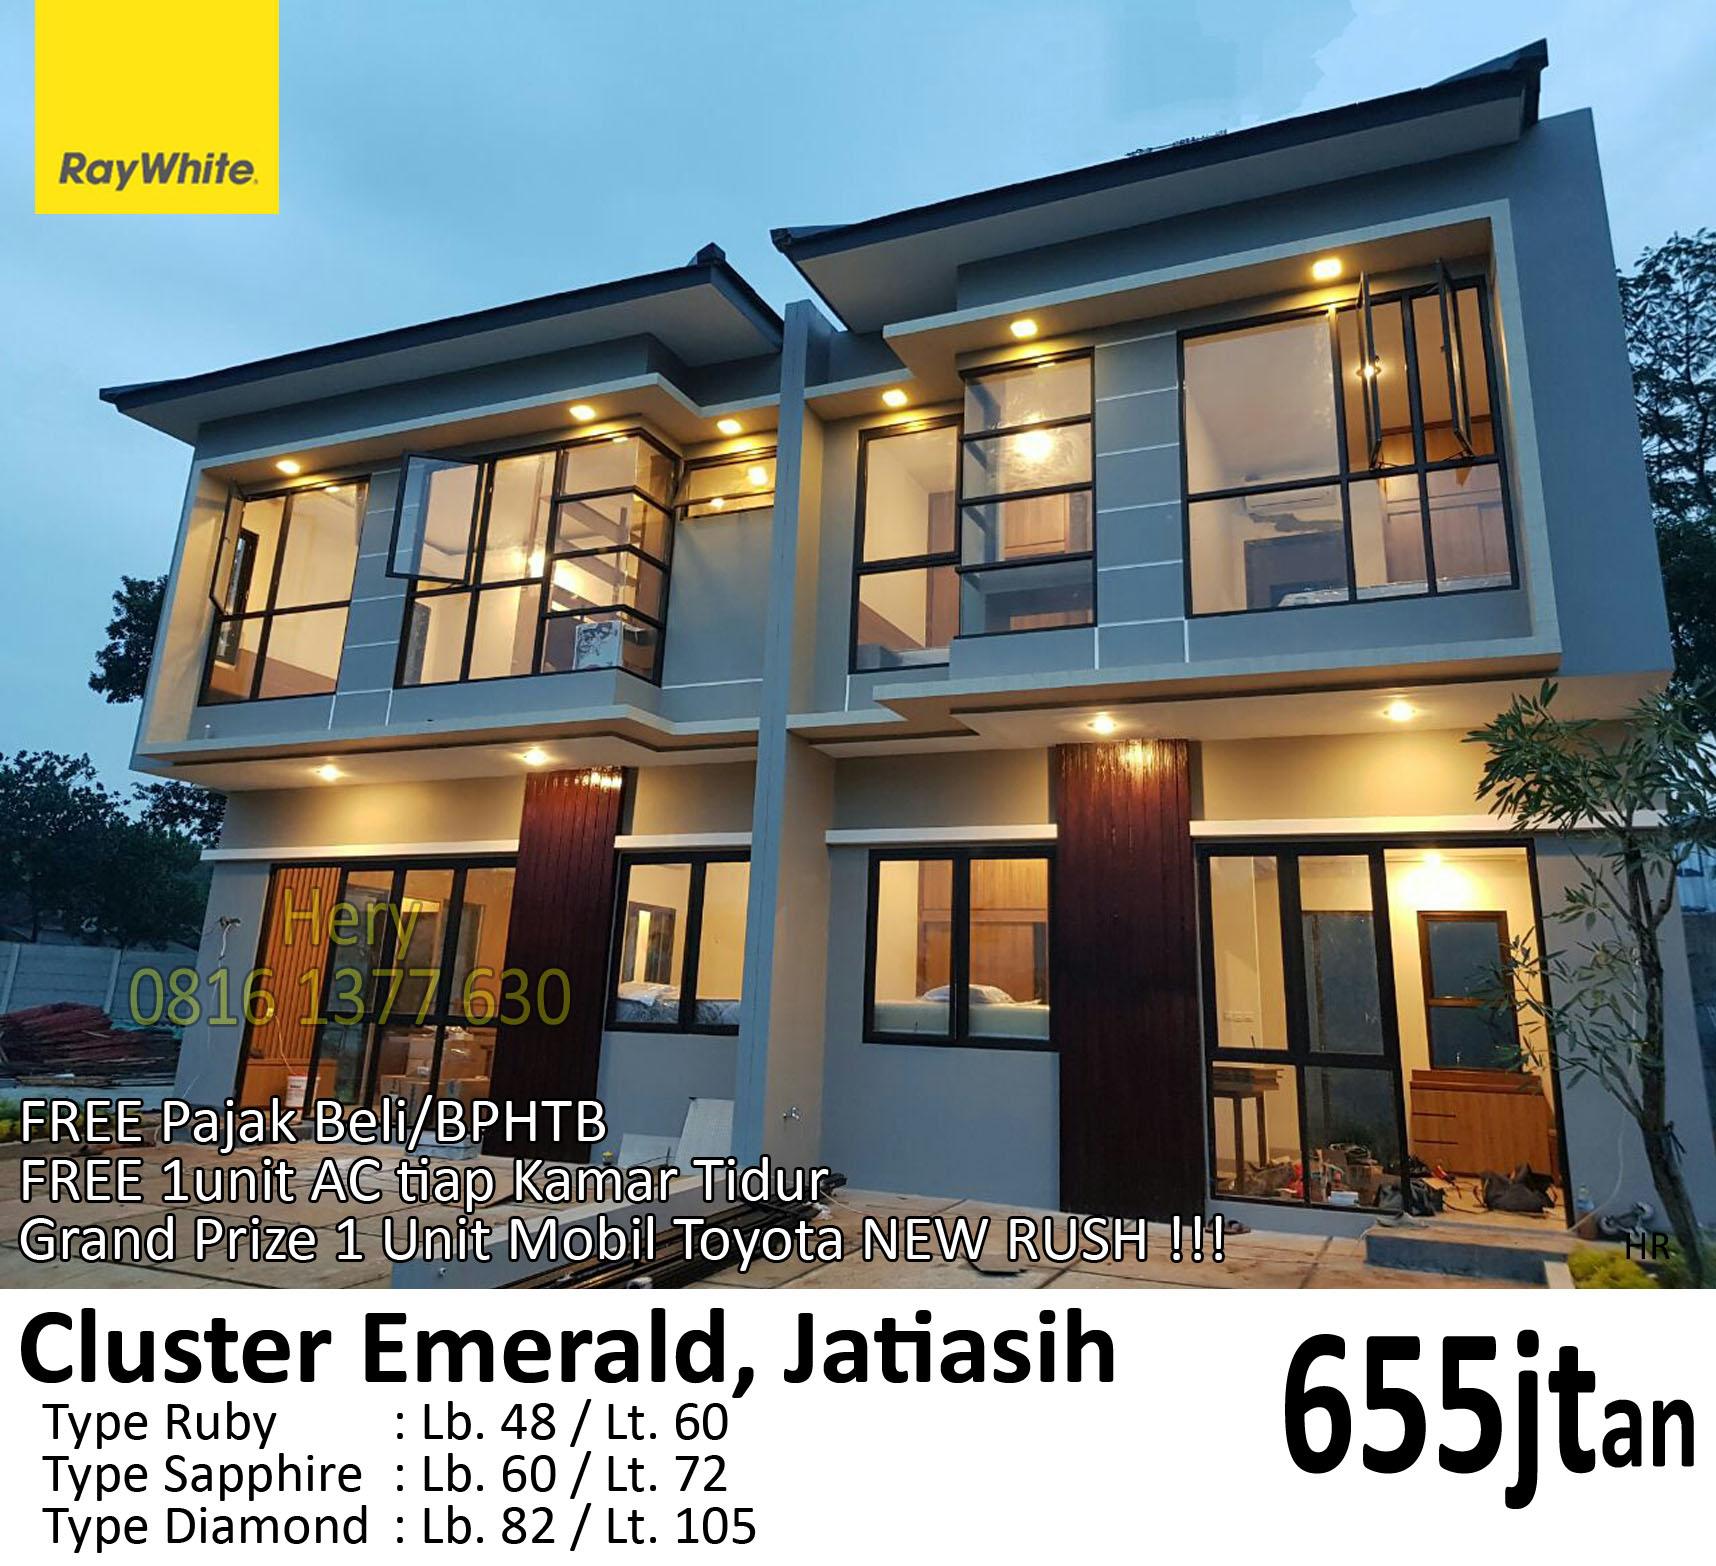 Rumah Baru Cluster Emerald Jatiasih Bekasi 600jtan - | Ray ...